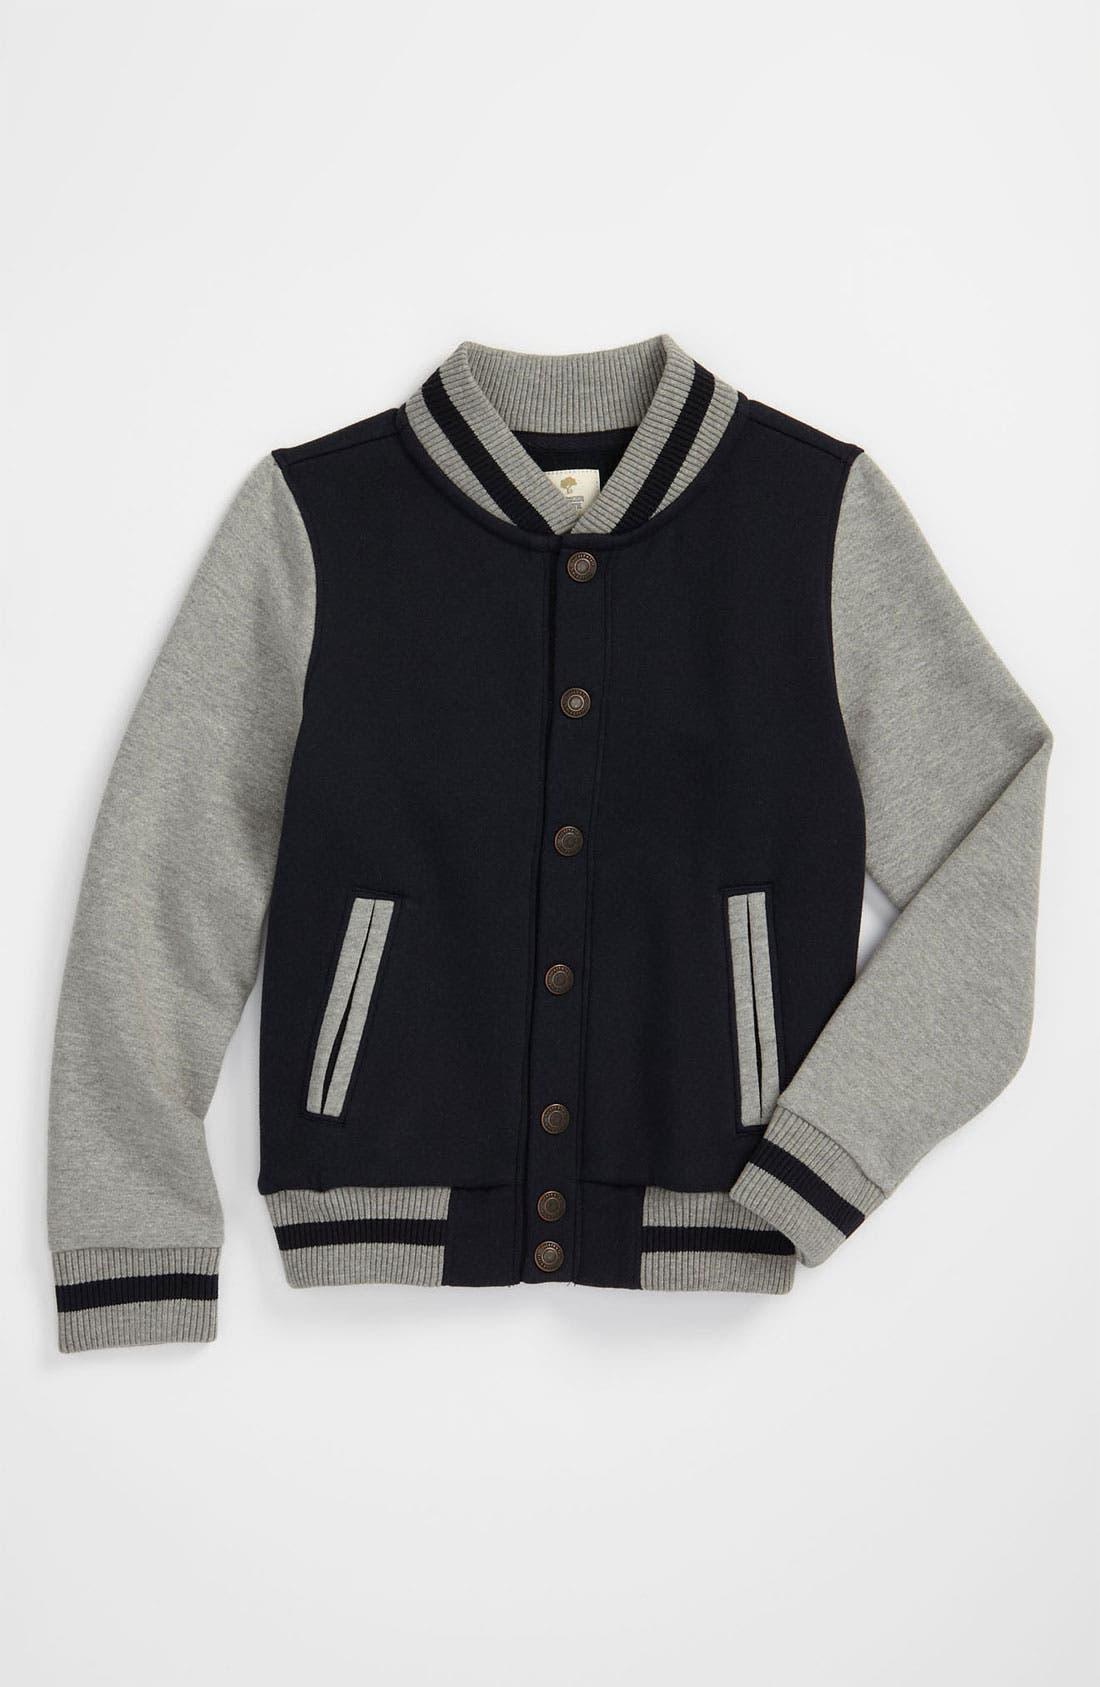 Main Image - Tucker + Tate 'Emmit' Varsity Jacket (Big Boys)